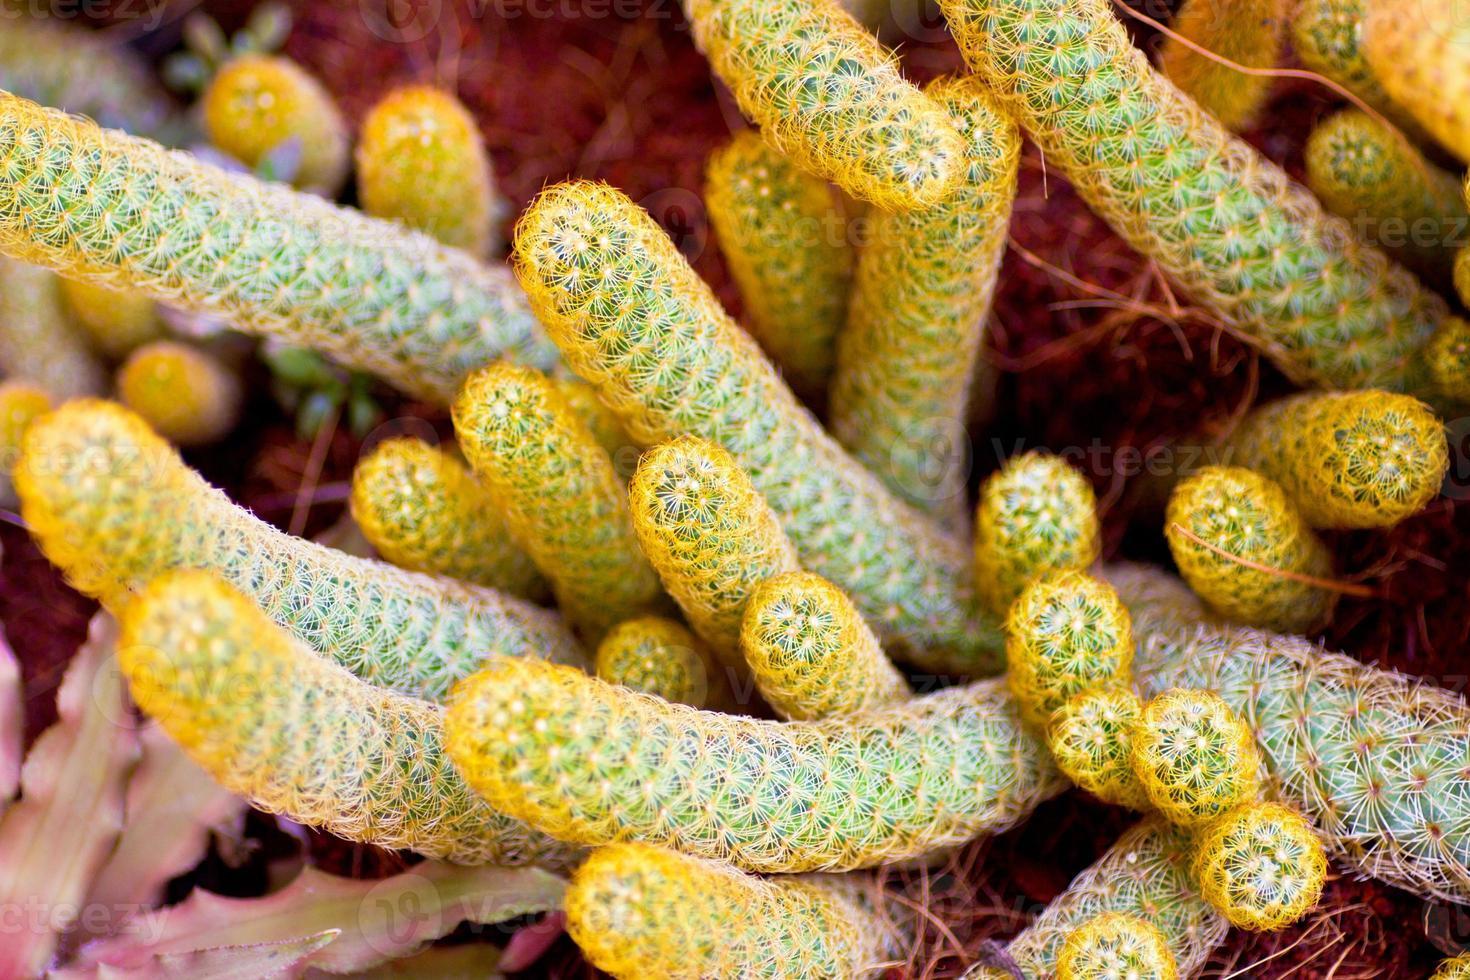 Cactus flowers photo